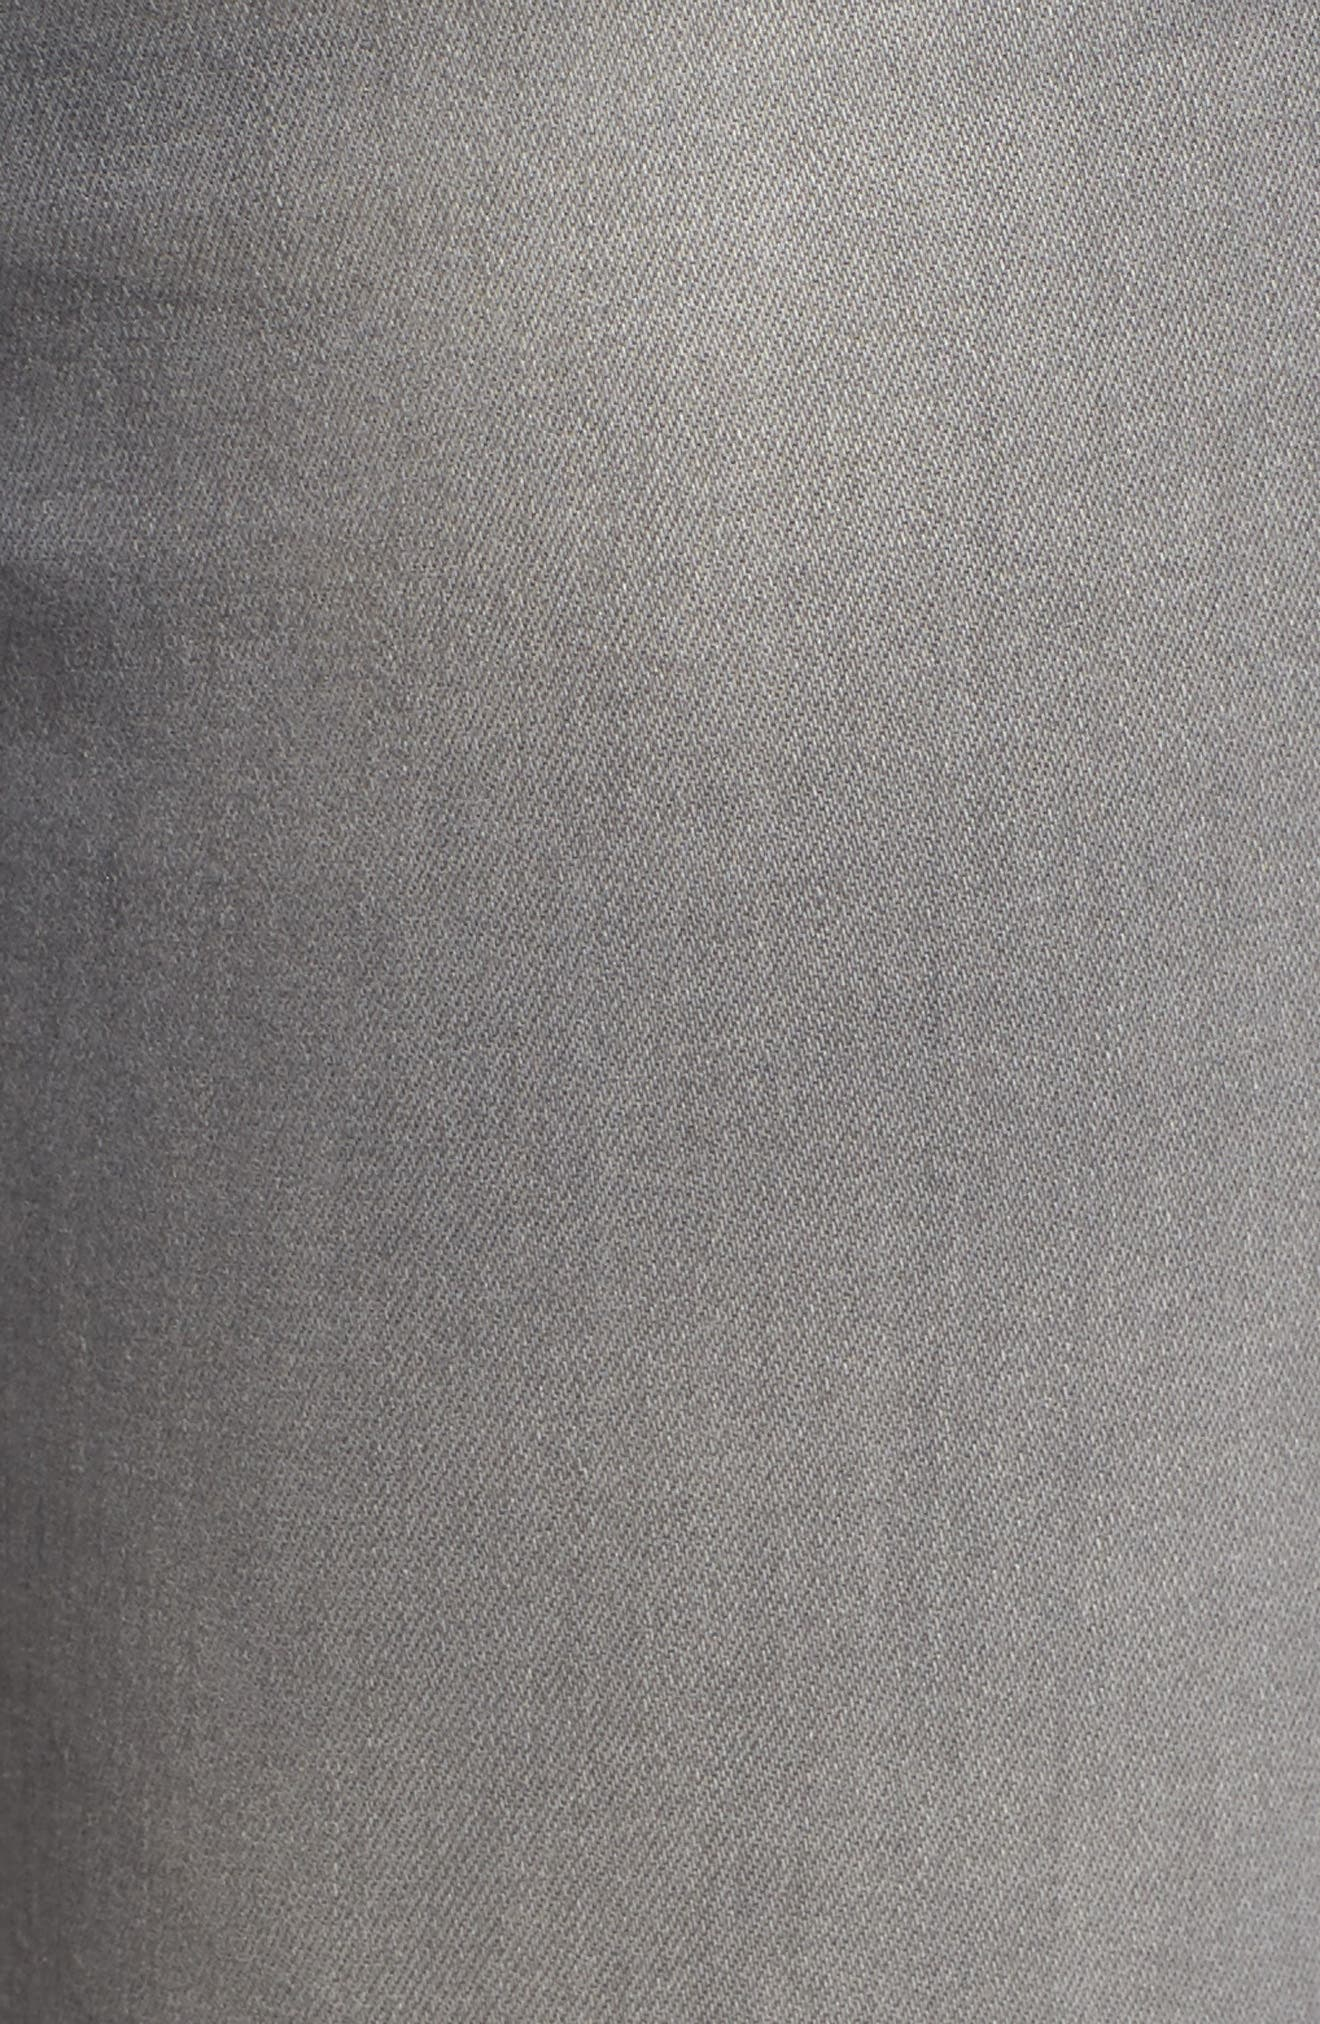 Farrah High Waist Ankle Skinny Jeans,                             Alternate thumbnail 5, color,                             10 Years Grey Shadow